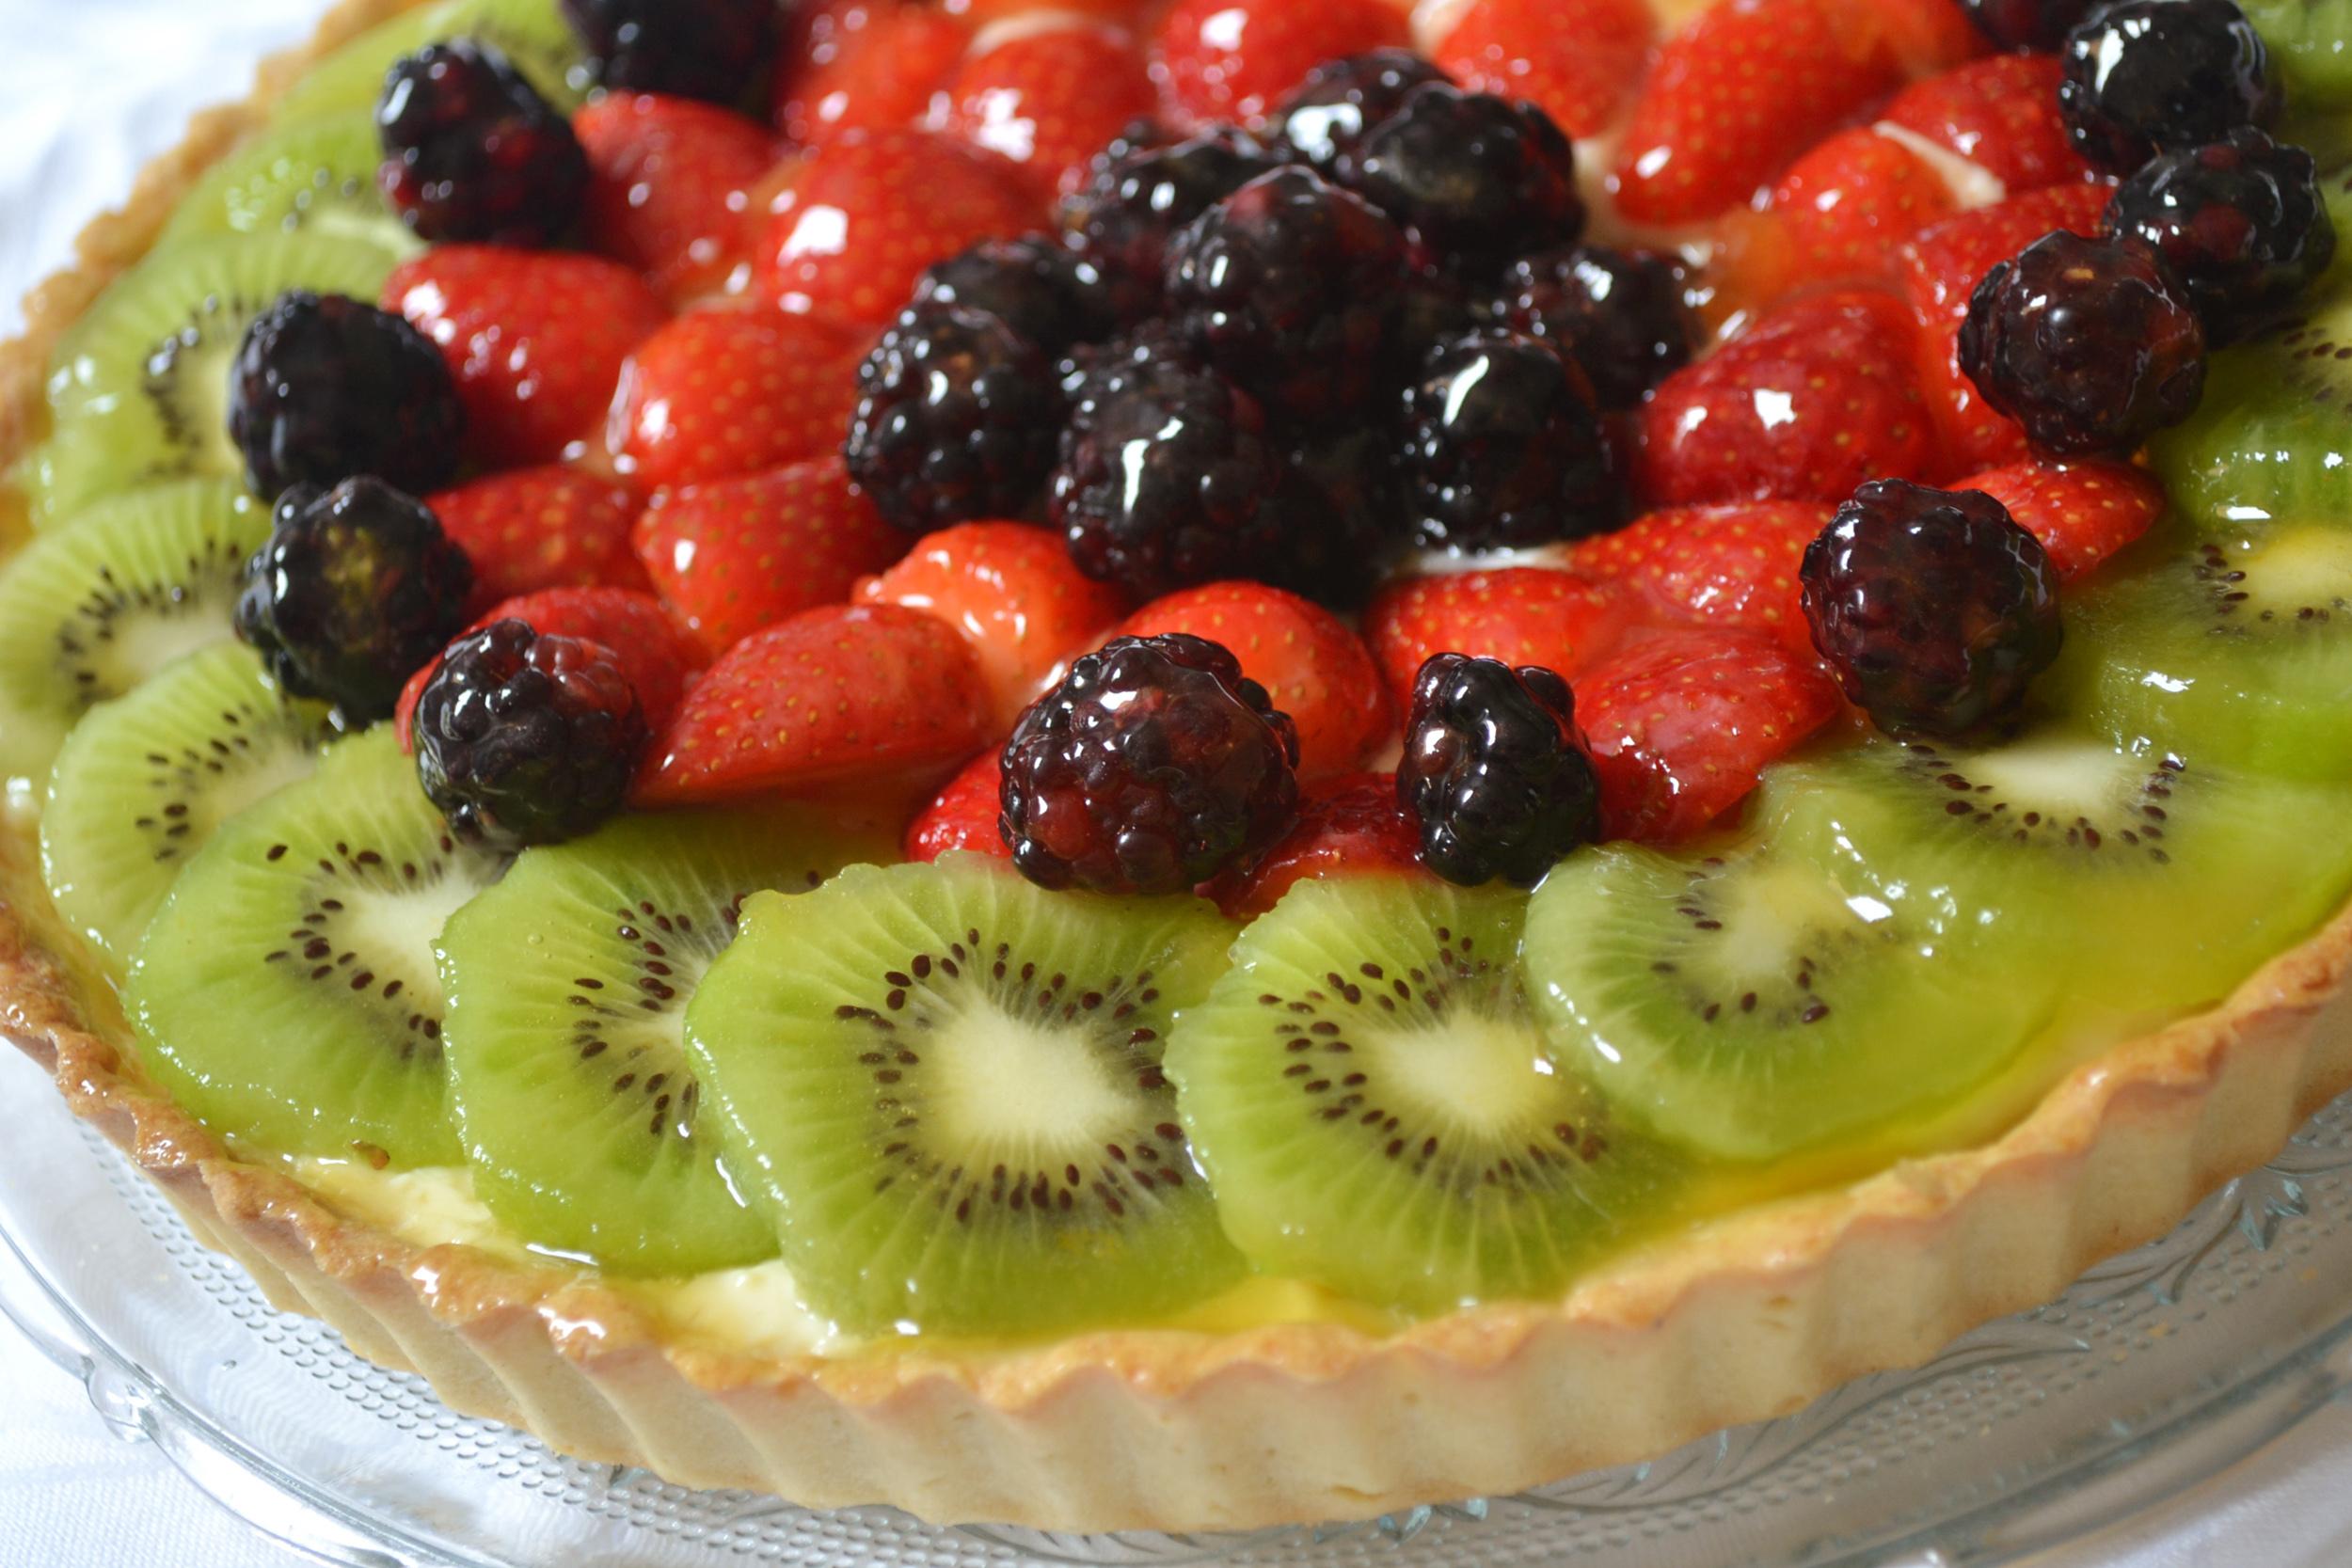 de torta de frutas com brilho de gel